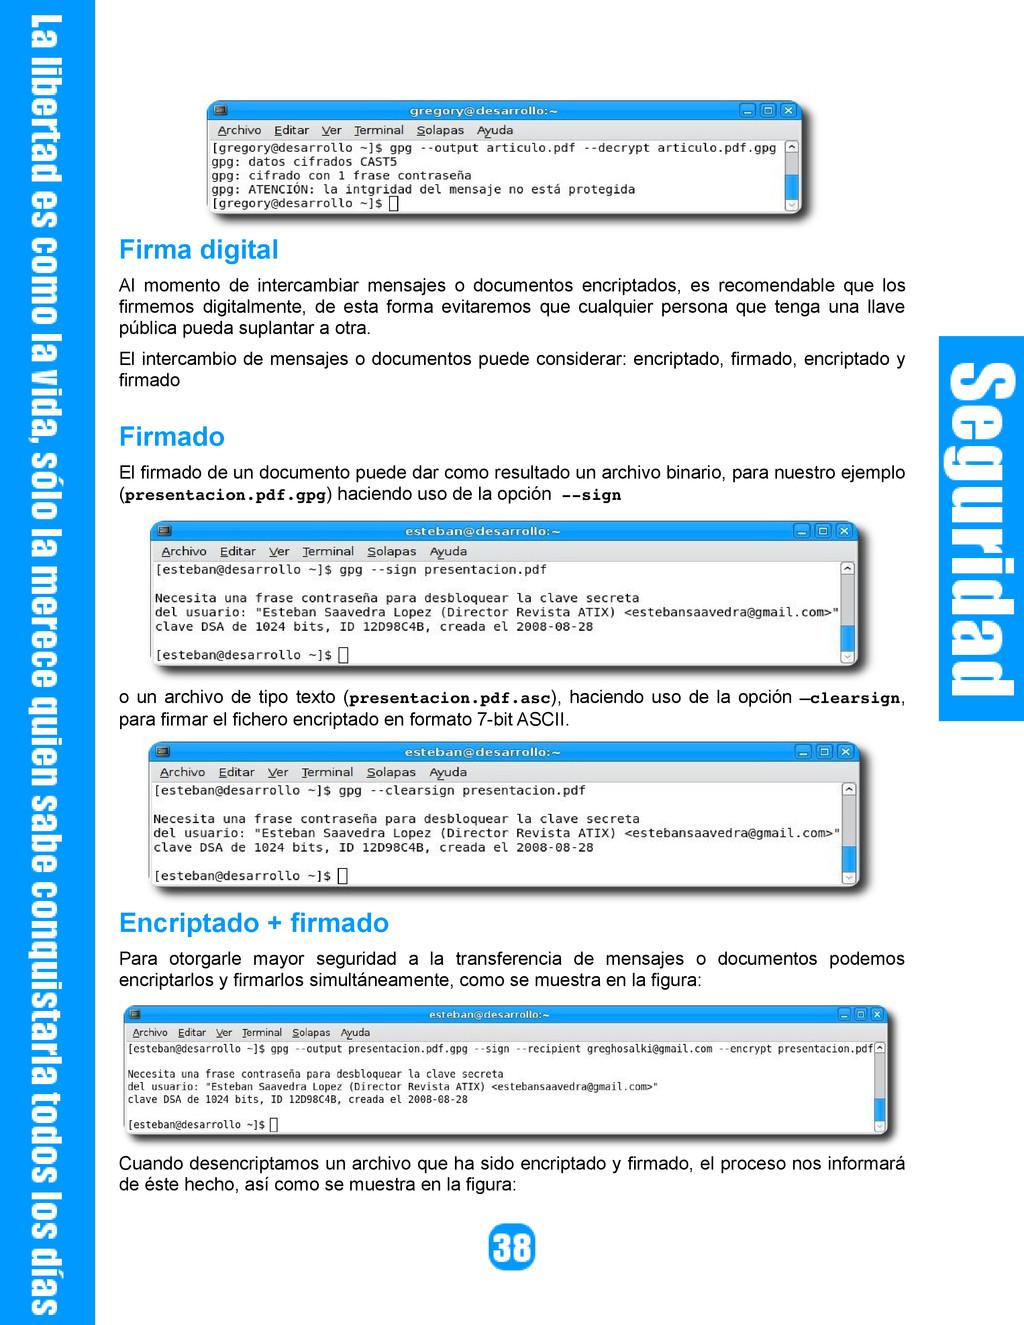 Firma digital Al momento de intercambiar mensaj...